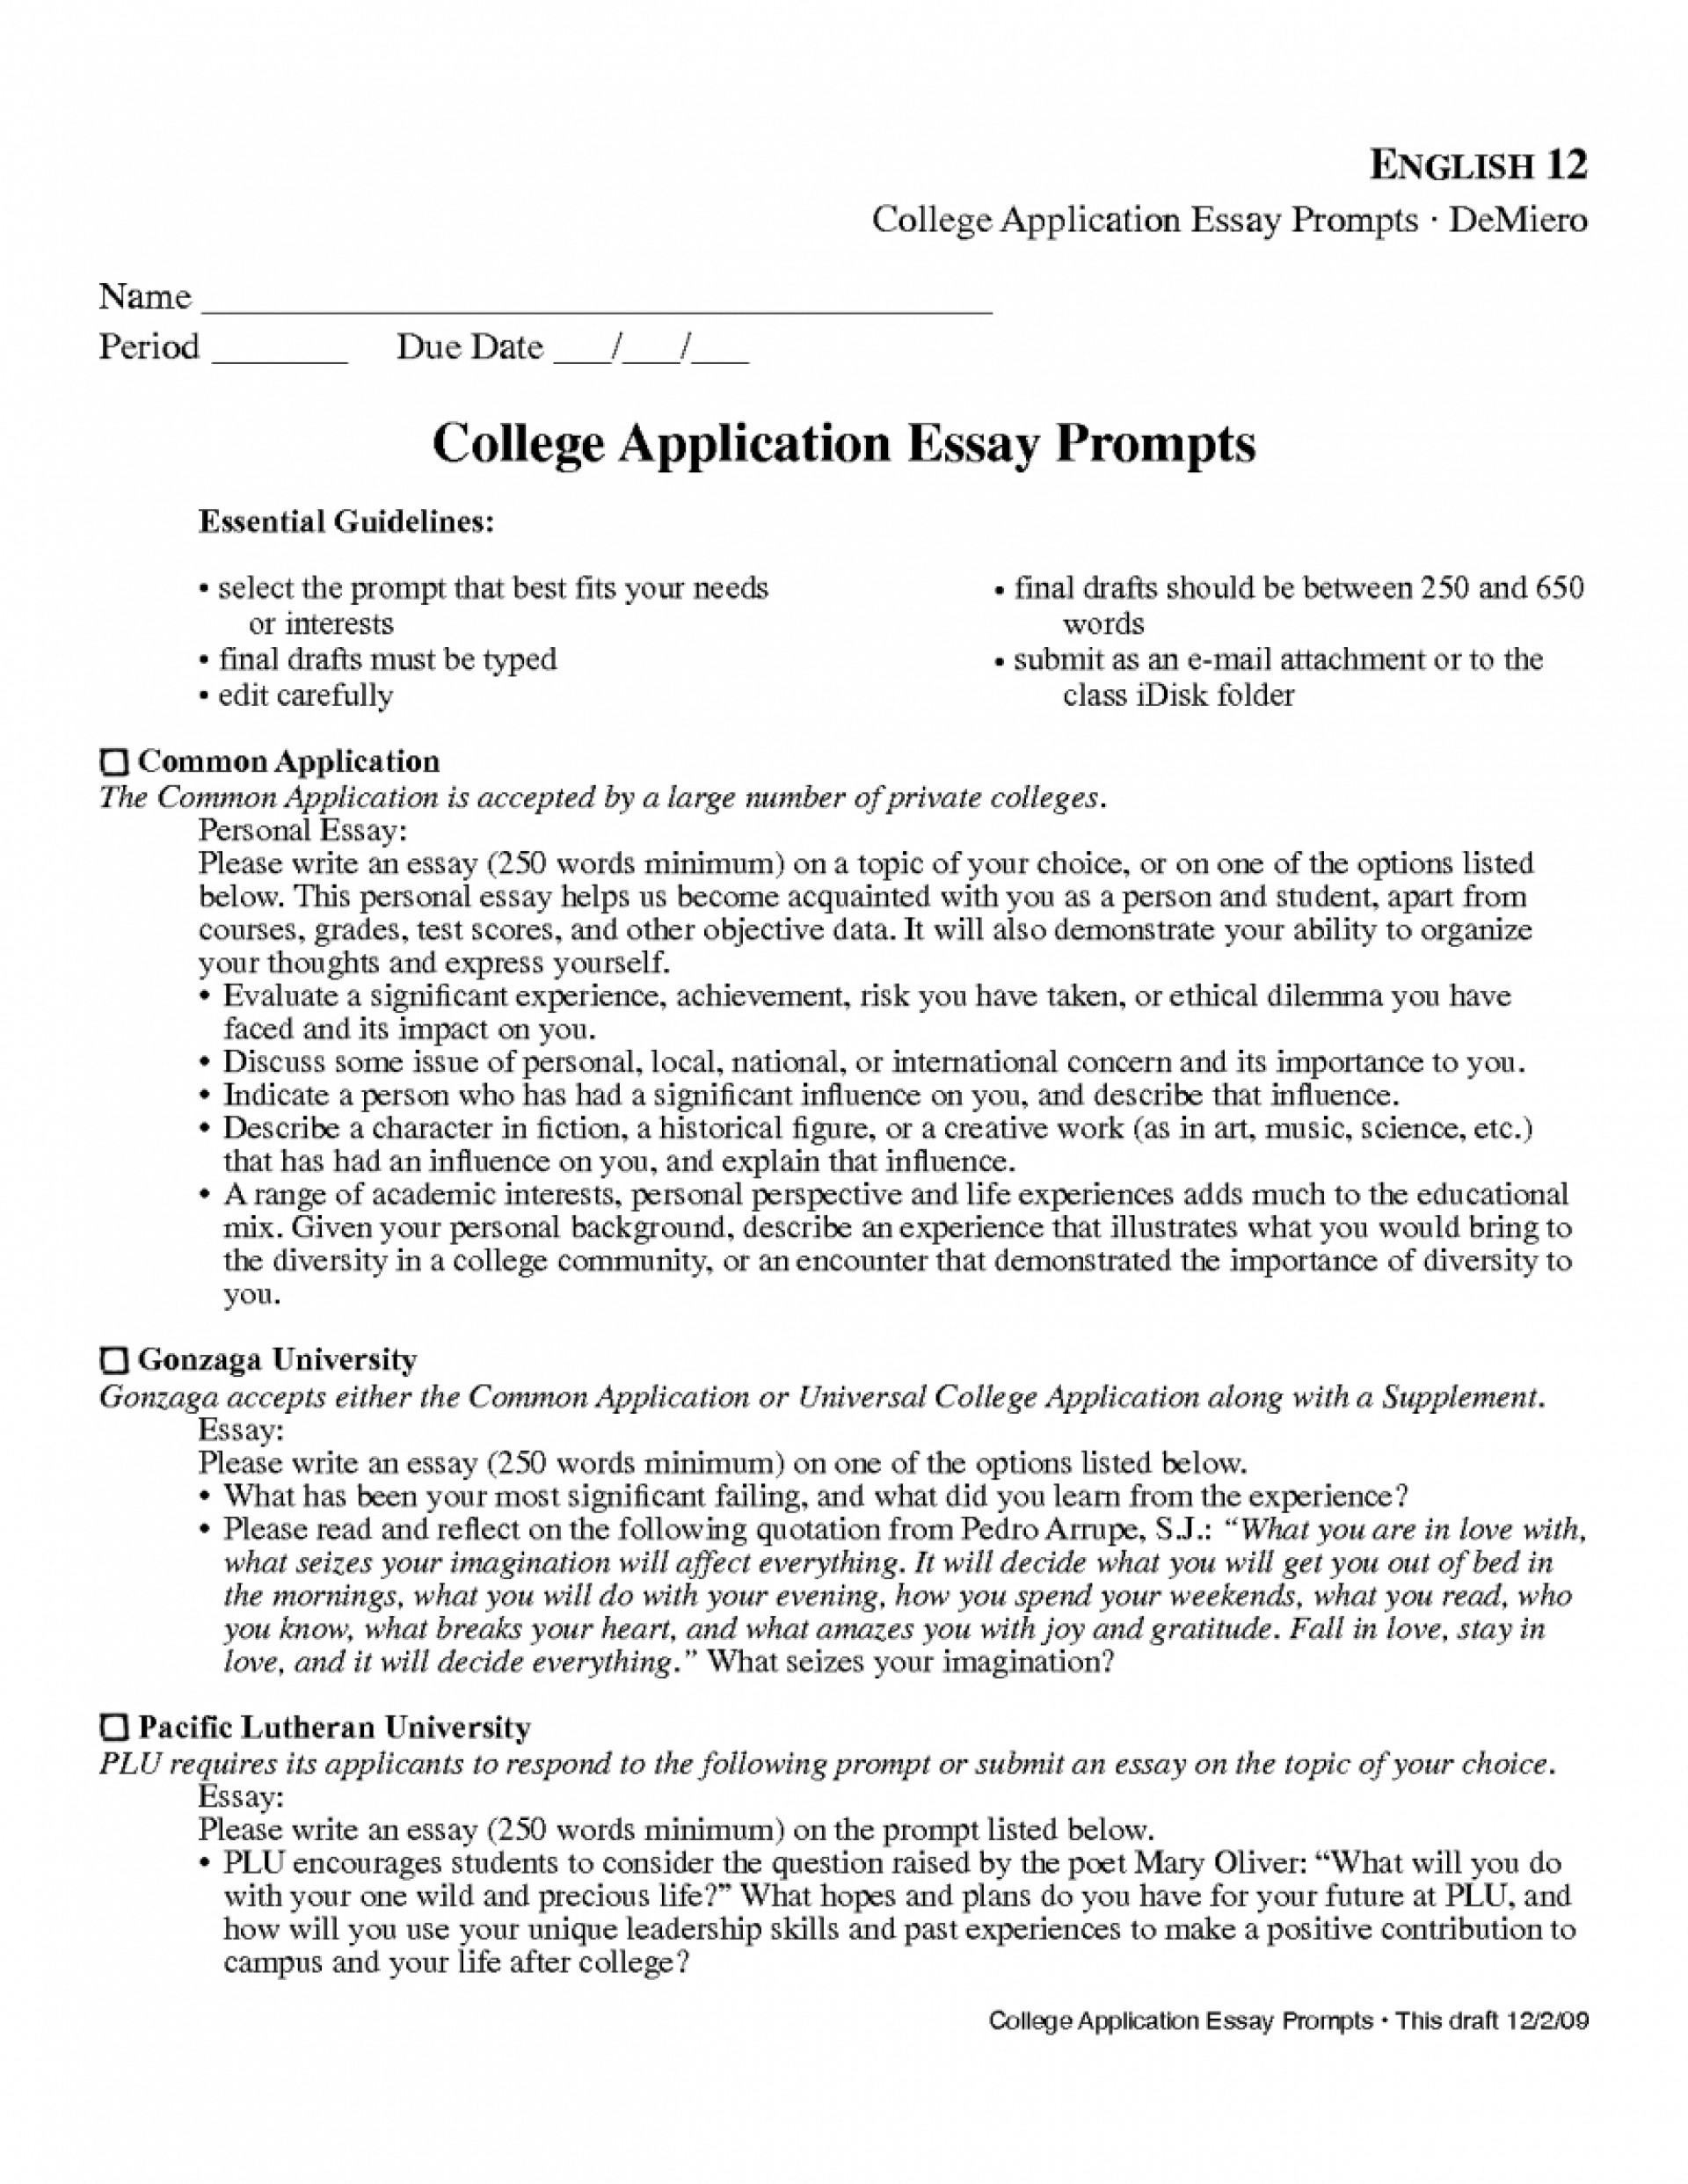 csu application essays